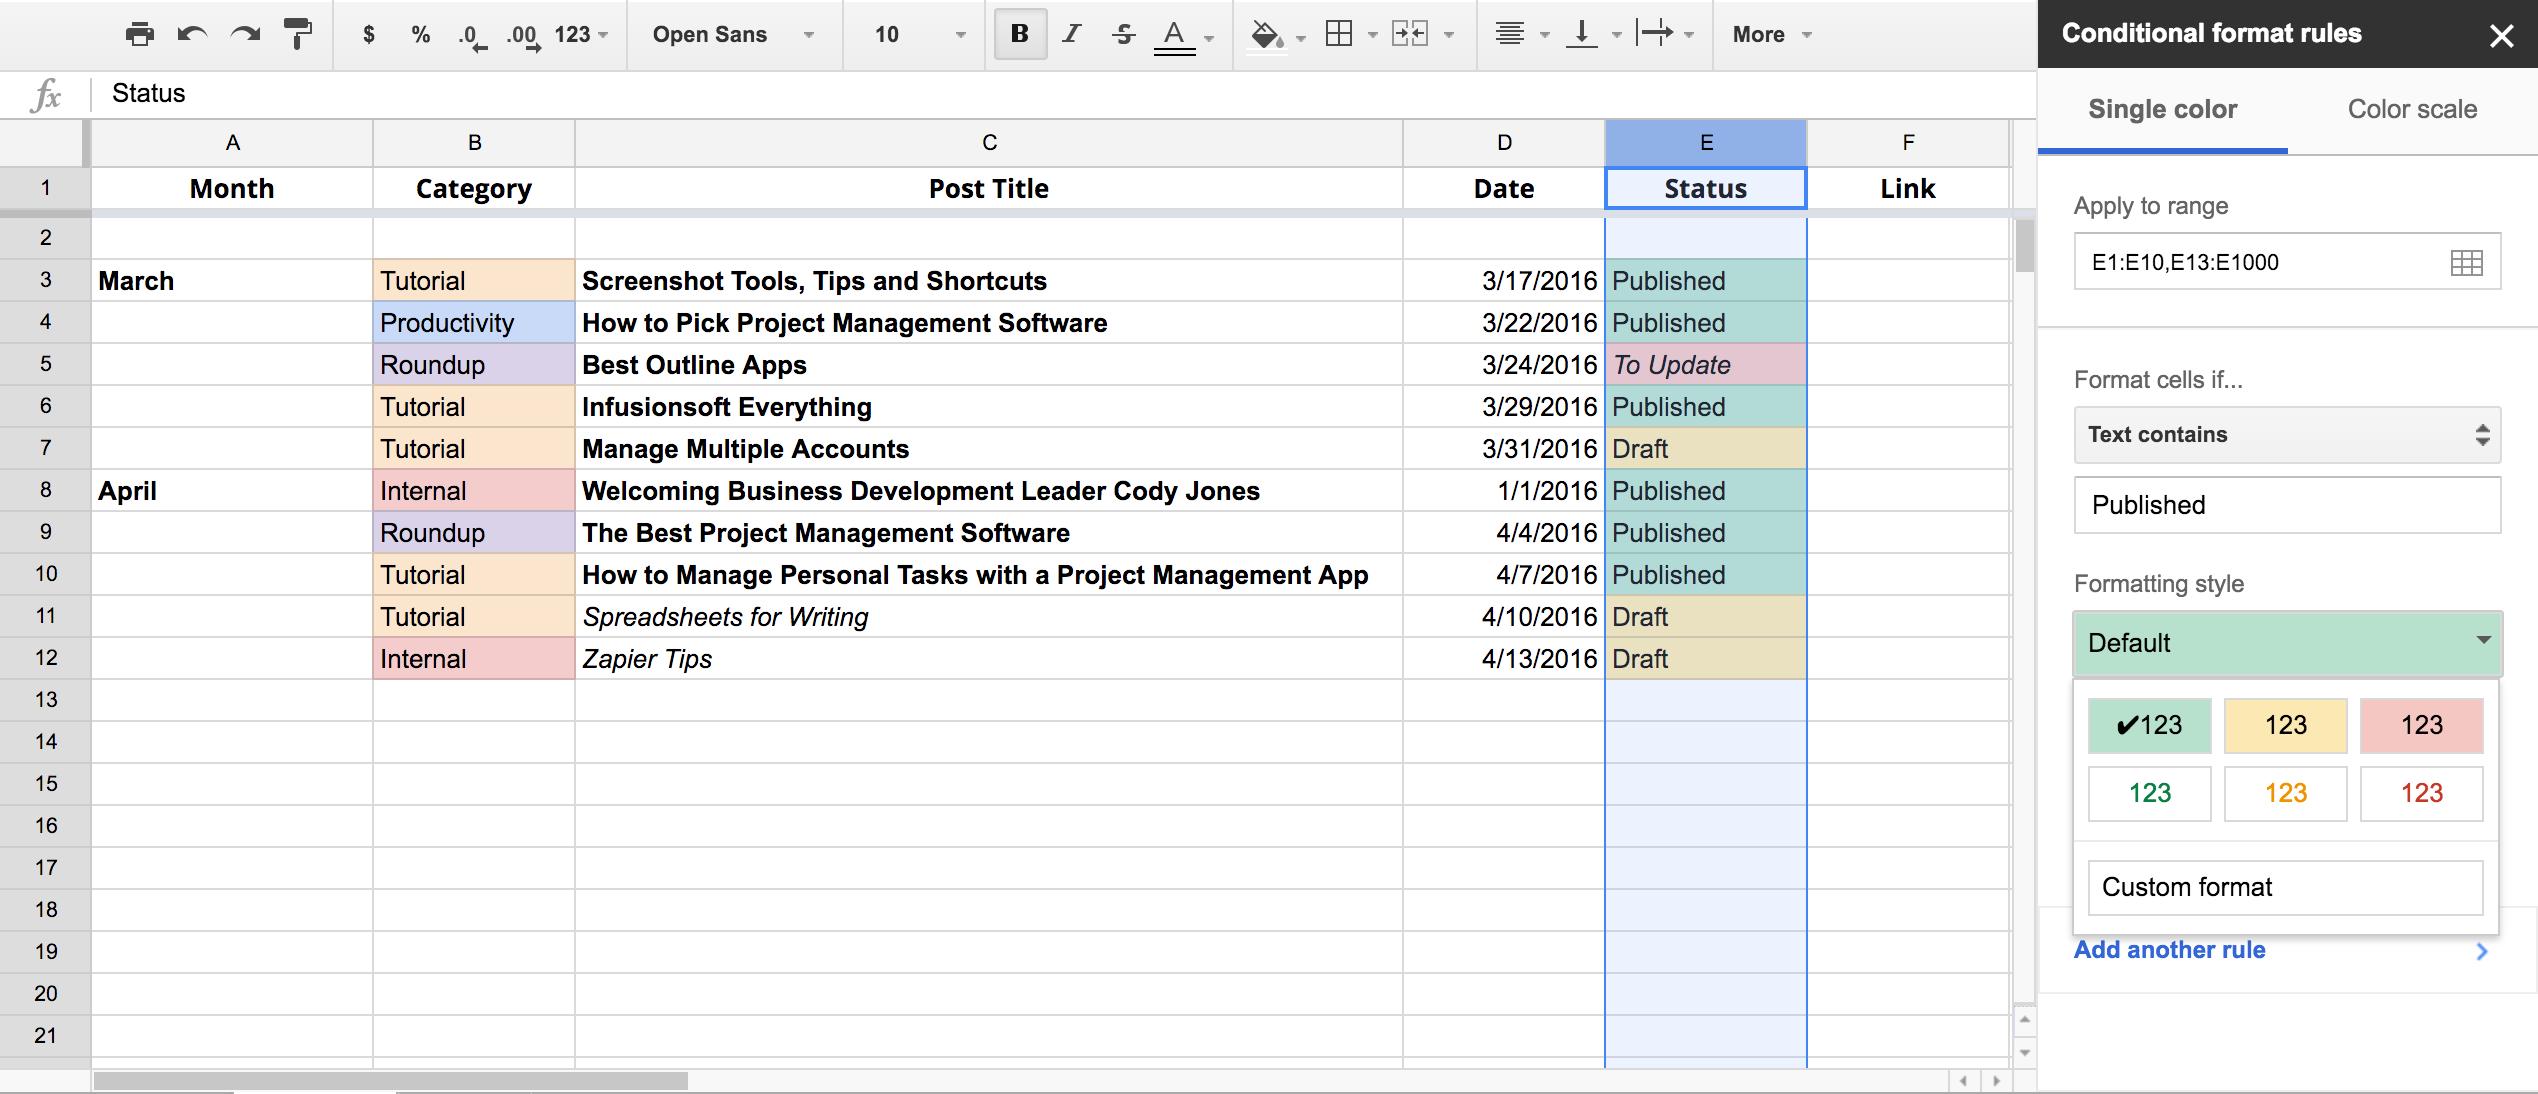 Convert Excel Spreadsheet To Calendar | Printable Calendar 2020 2021 Within Convert Excel File To Calendar